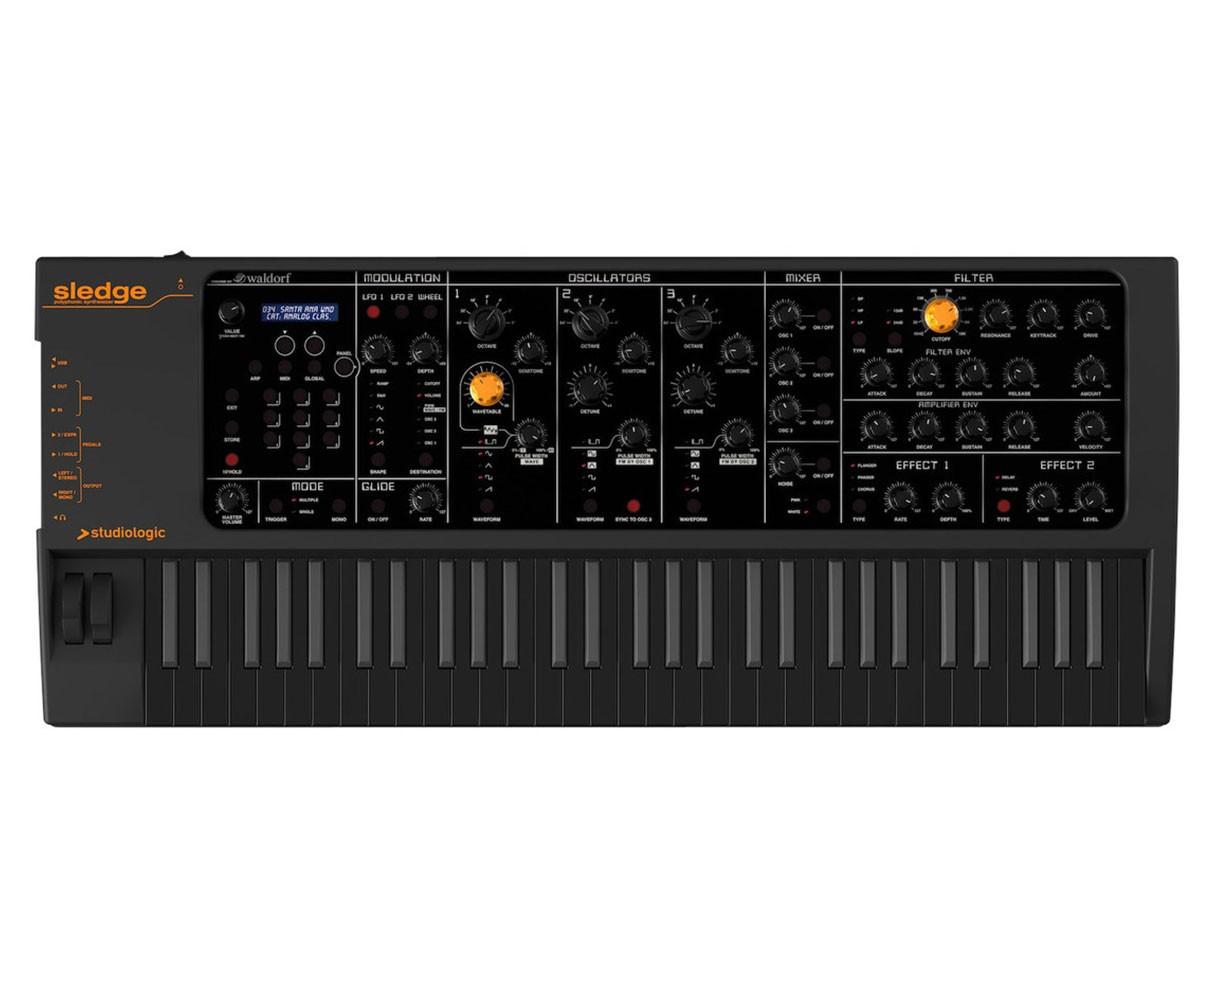 StudioLogic Sledge 2.0 61-Key Piano Black